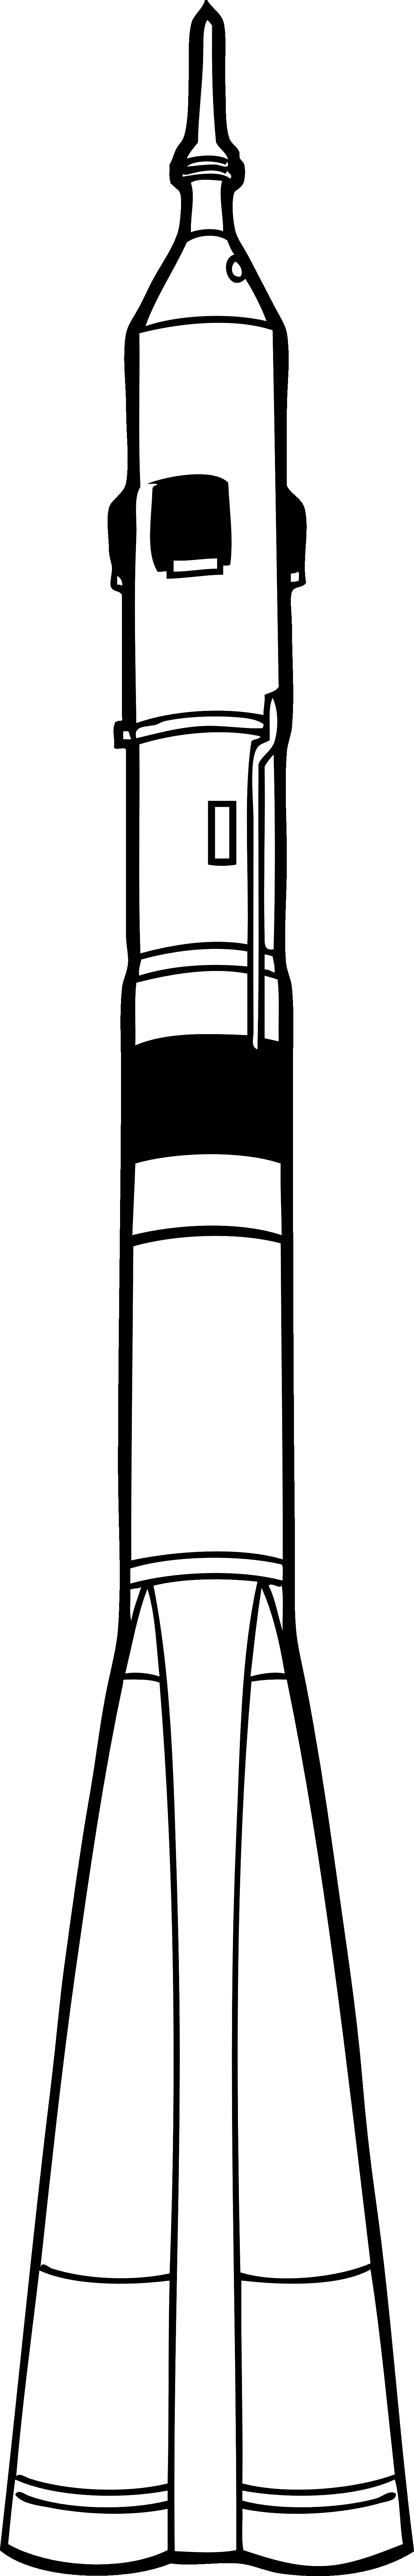 soyuz rocket black white line art coloring book.